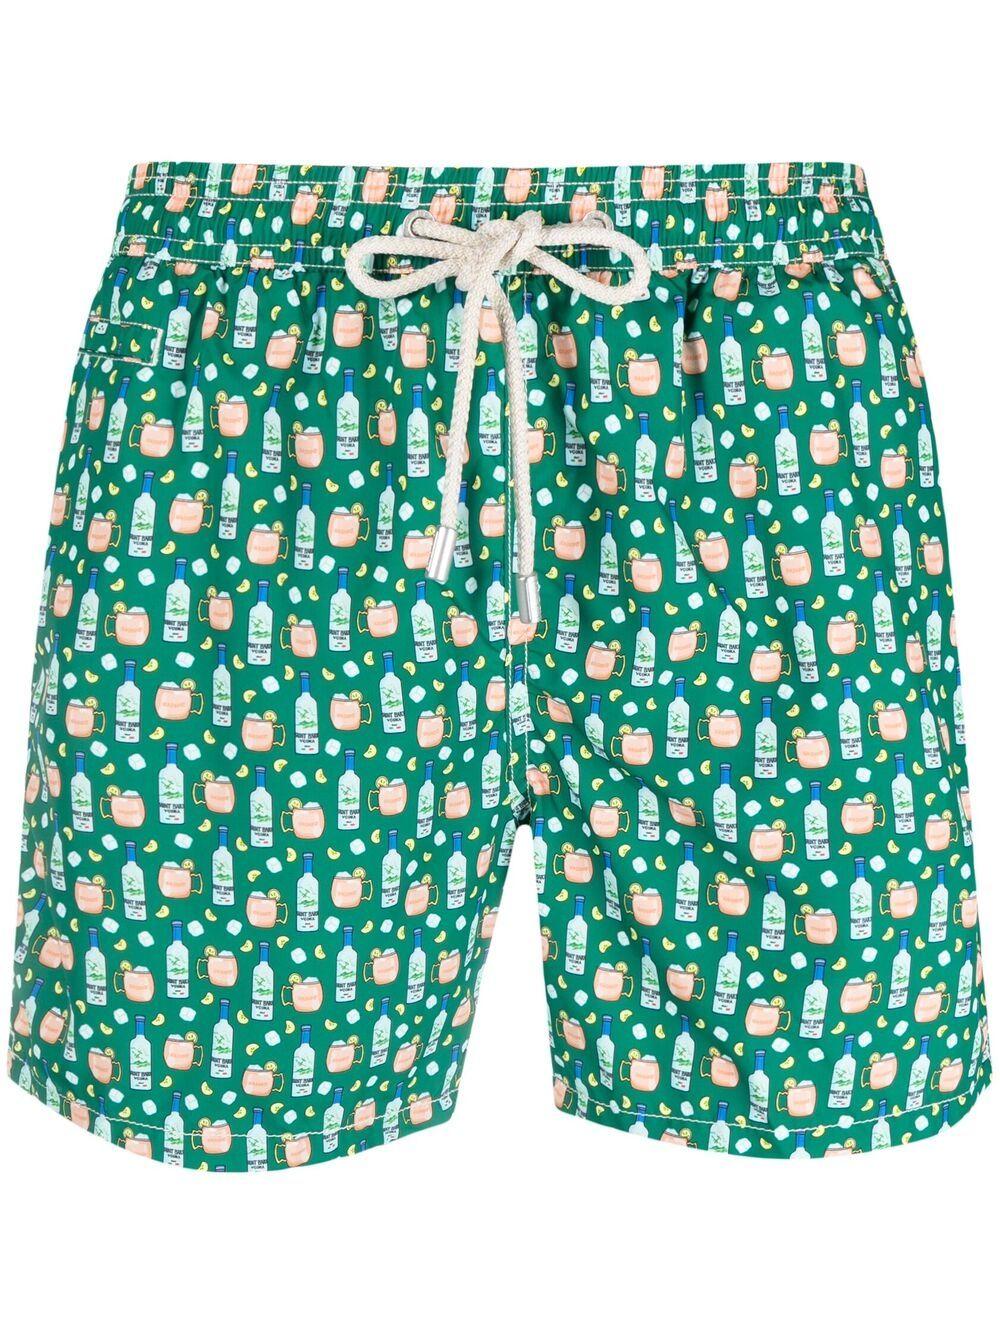 green recycled polyester Lighting Vodka graphic-print swim shorts  MC2 |  | LIGHTING MICRO FANTASY-VODKA MULE51